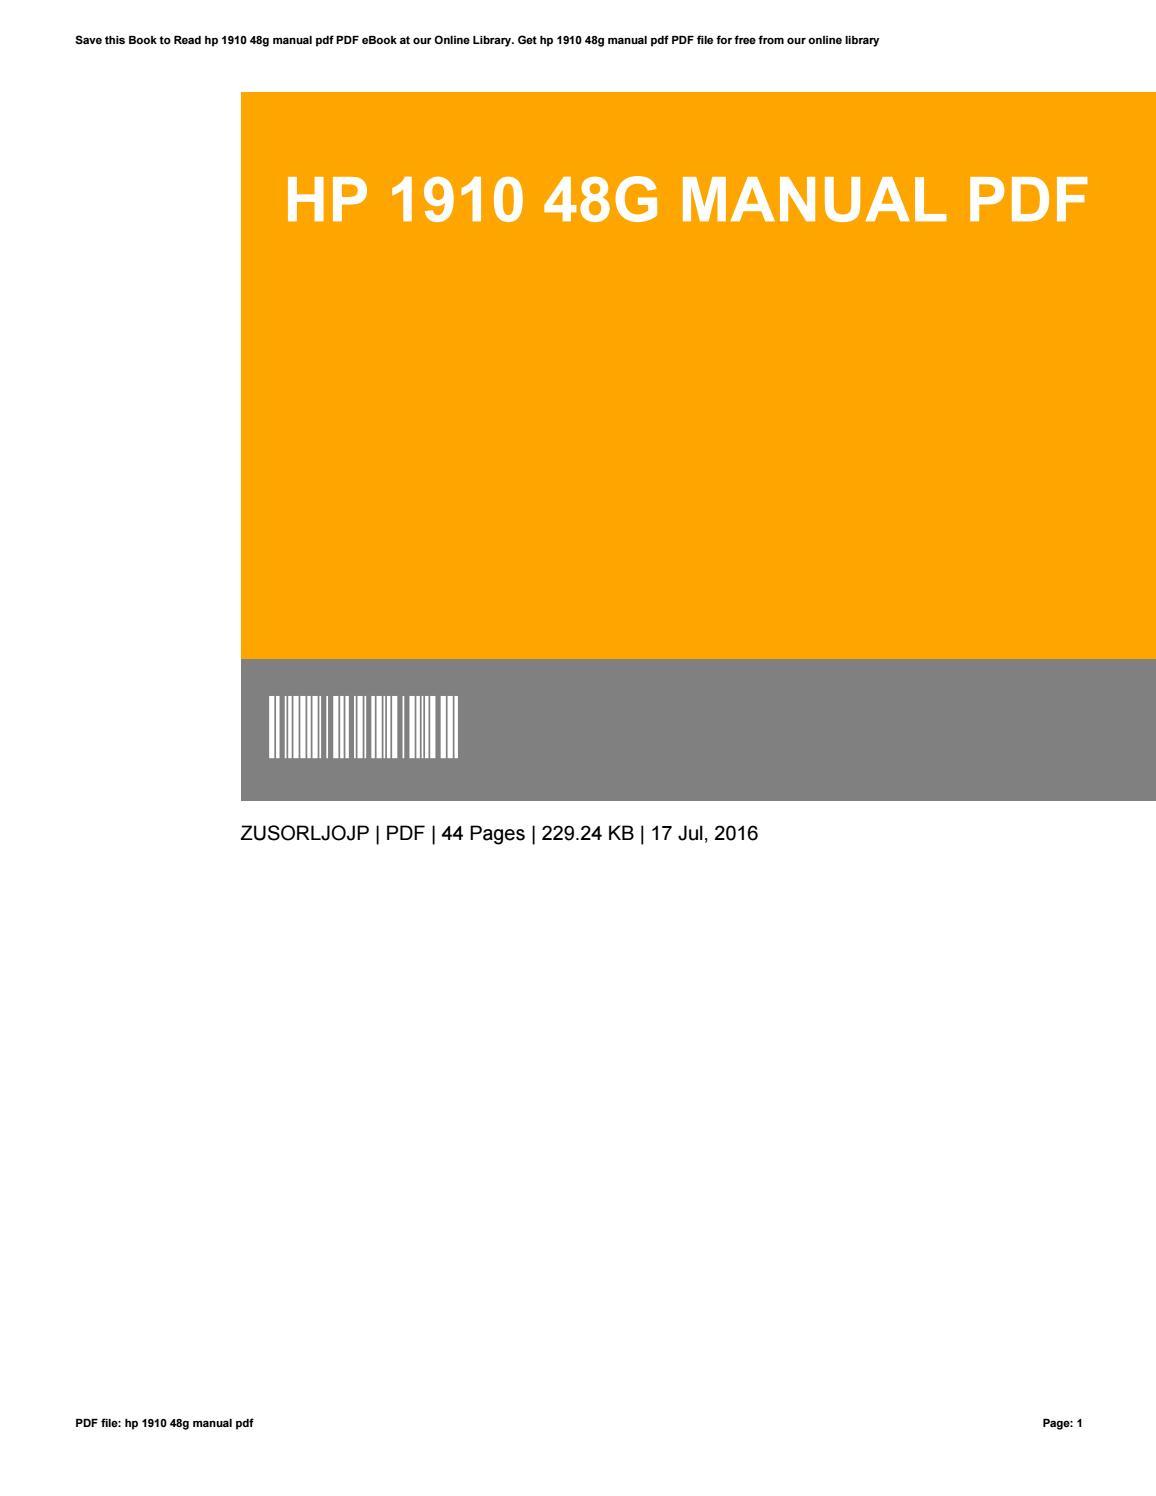 Hp 1910 48g manual pdf by crymail218 - issuu